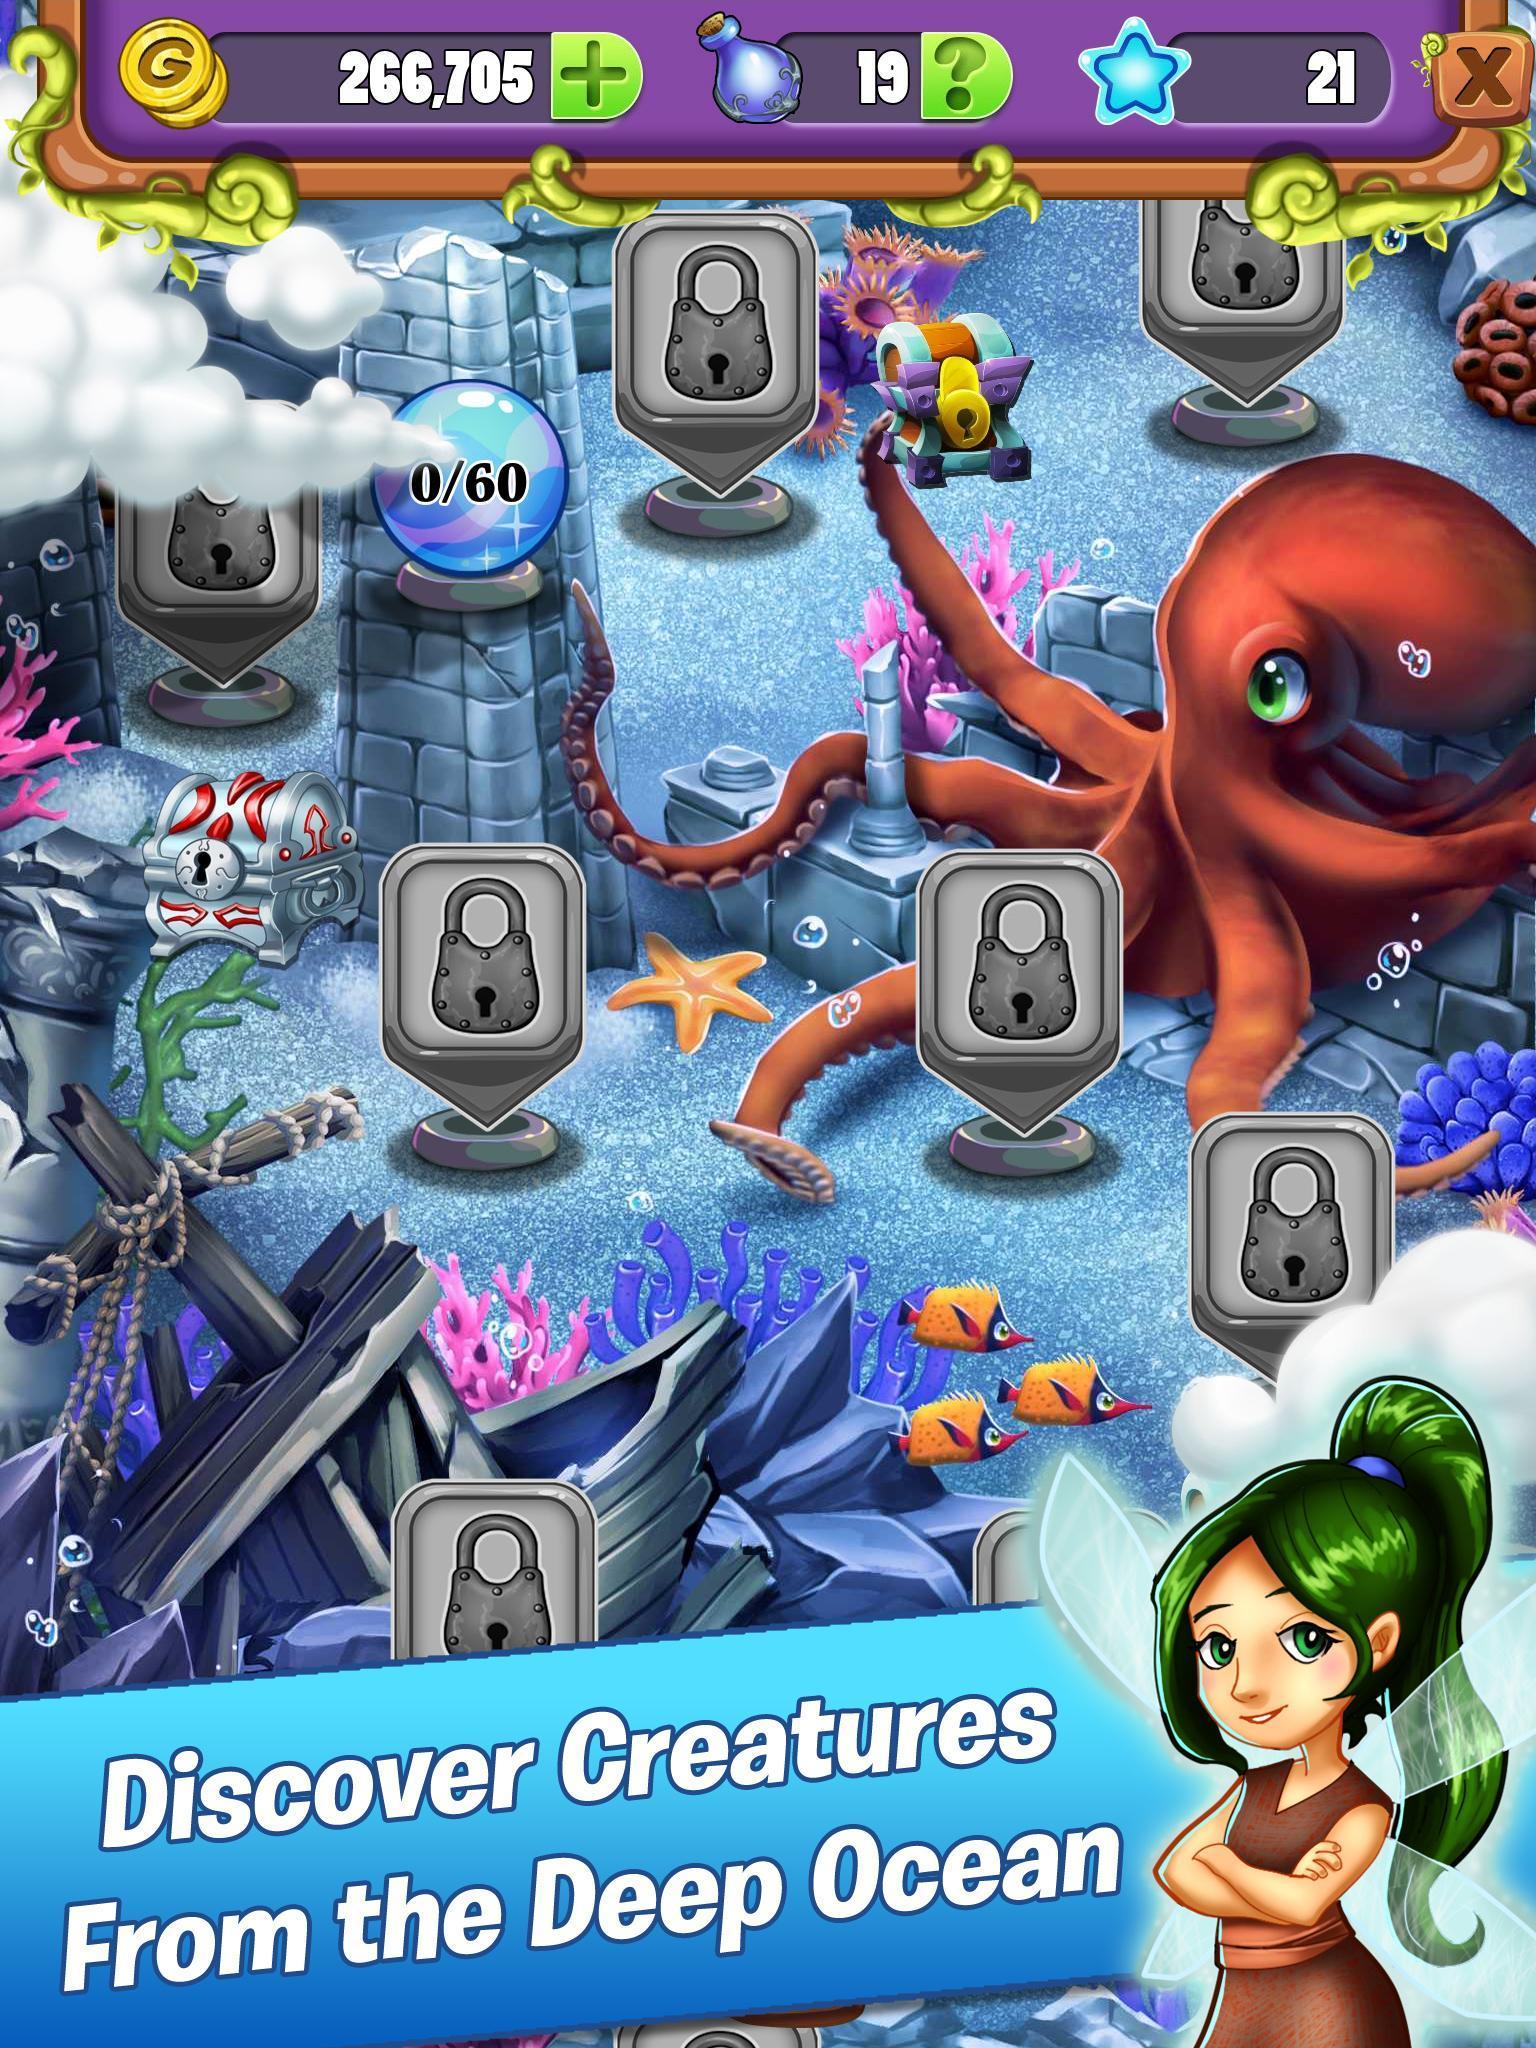 Mahjong - Mermaid Quest - Sirens of the Deep 1.0.42 Screenshot 4